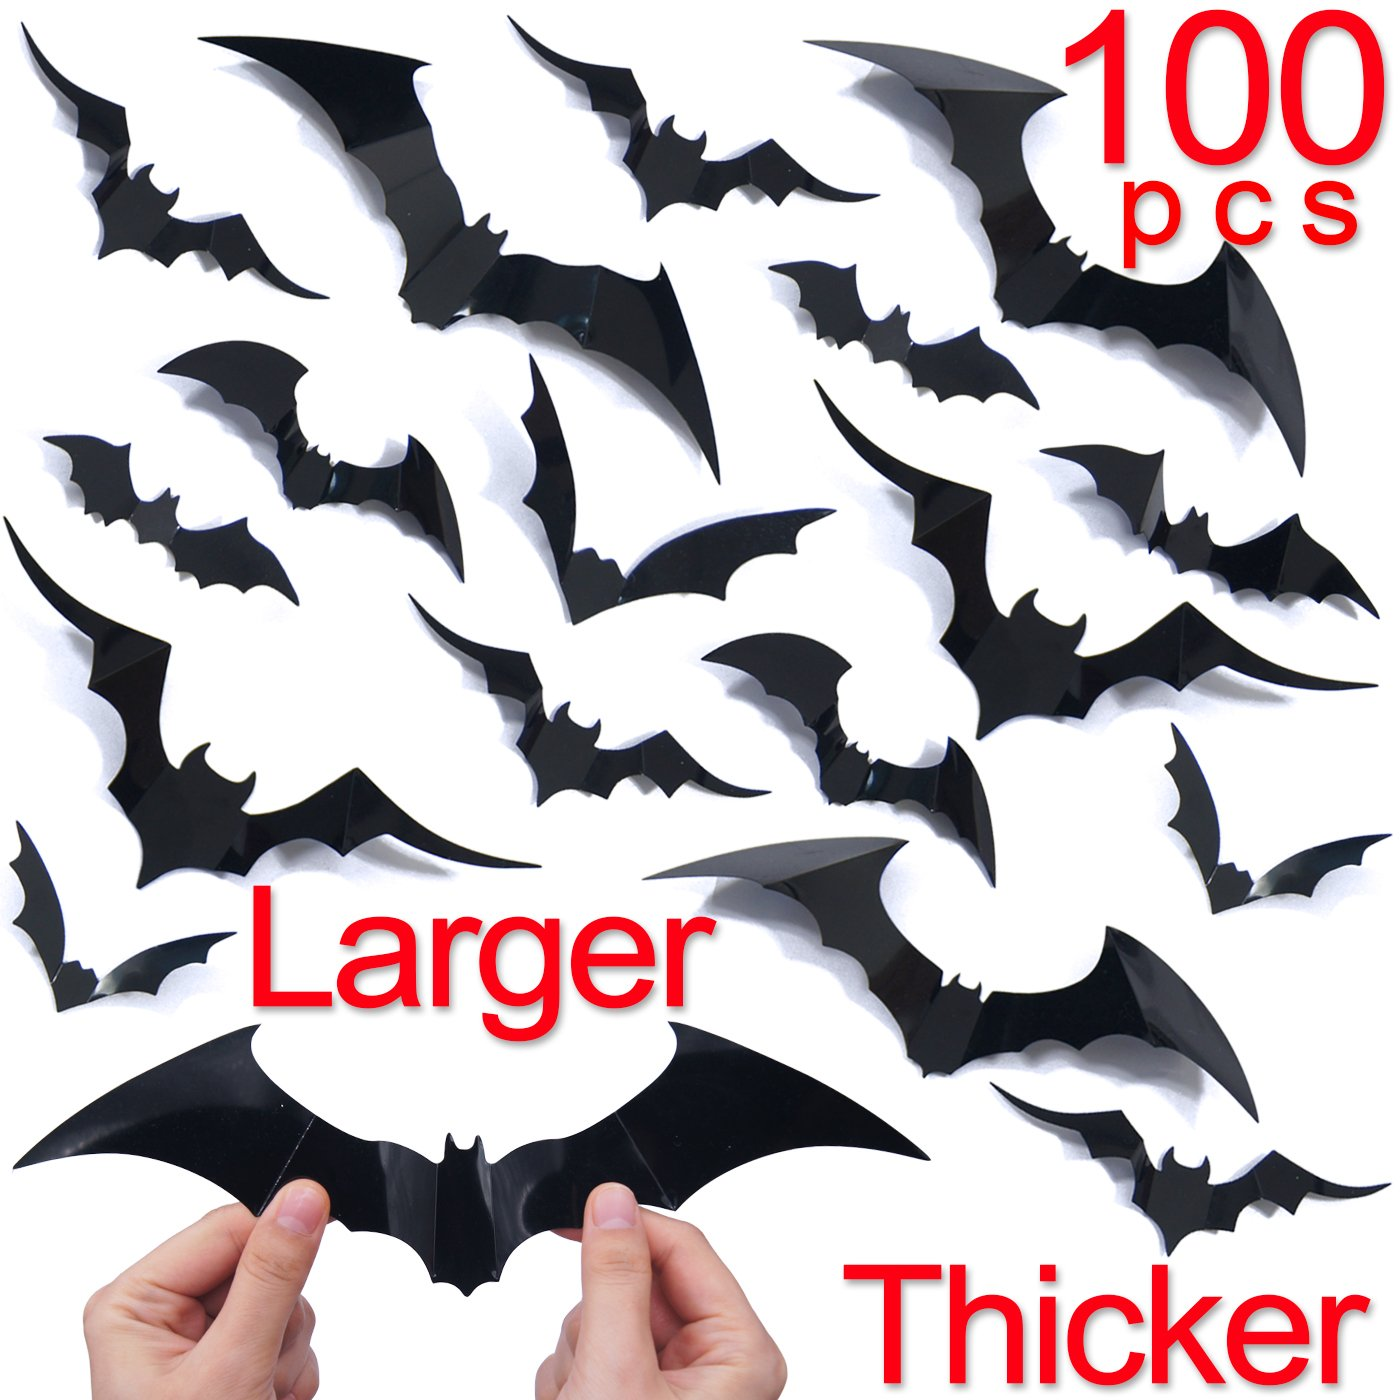 Ivenf Halloween Decorations Bat Wall Decals Stickers Decor 100 Pack, Extra Large 3D Bats Window Decals, Bat Halloween Door Decor